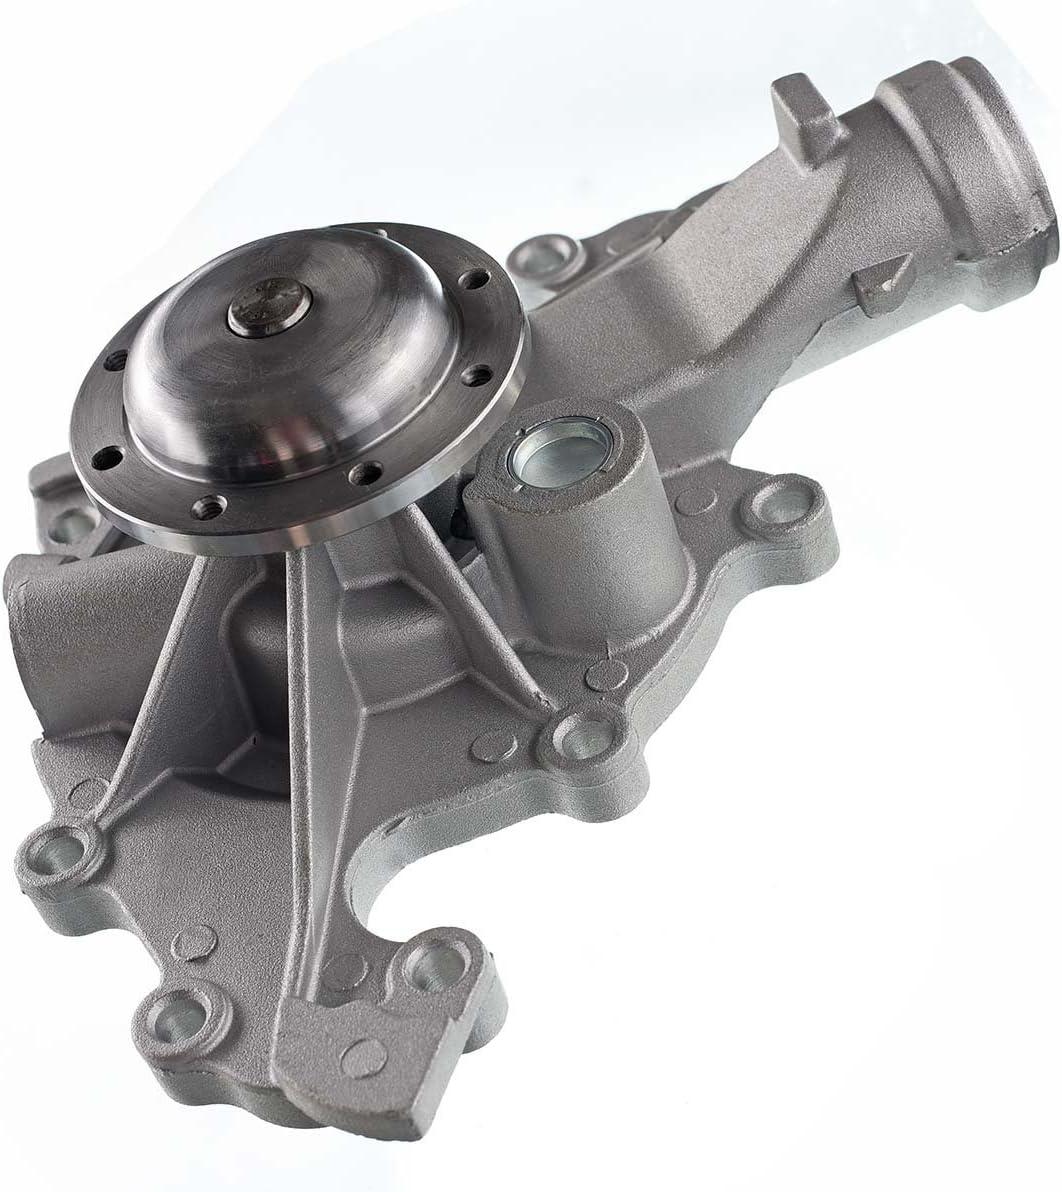 Engine Water Pump Kit for Mercury Monterey Ford Freestar 2004-2007 Windstar 1996-2003